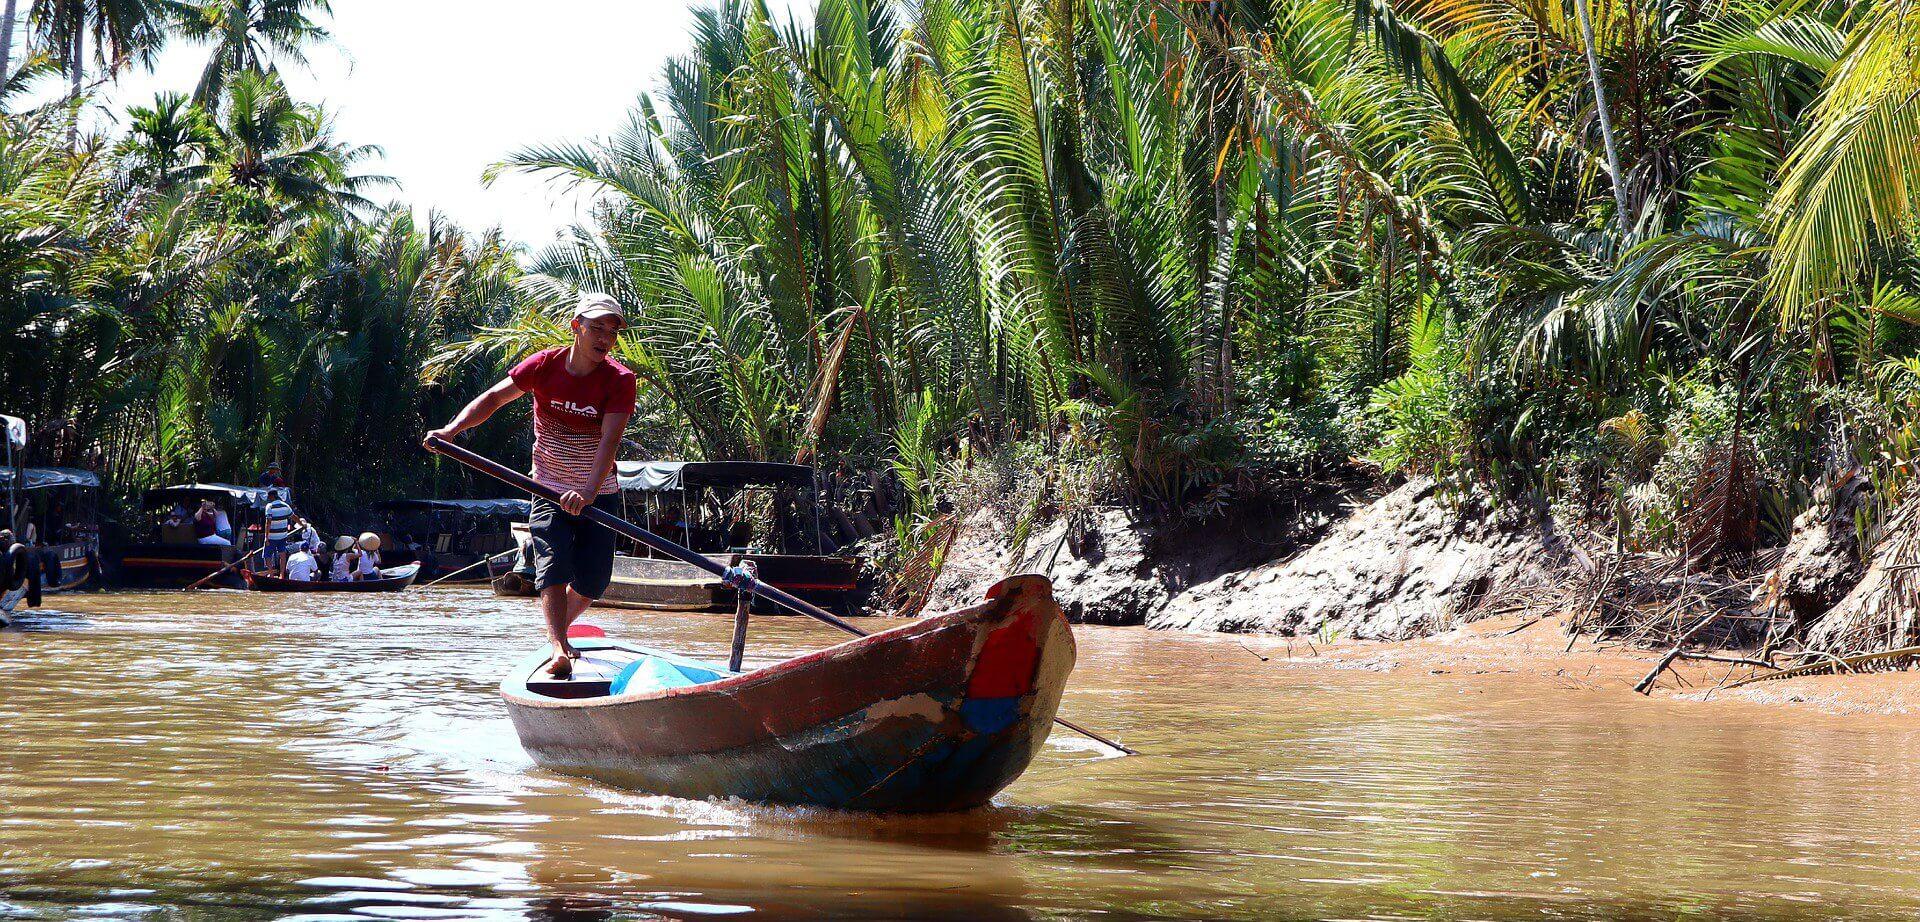 Mekong Delta vietnam-4888693_1920PX